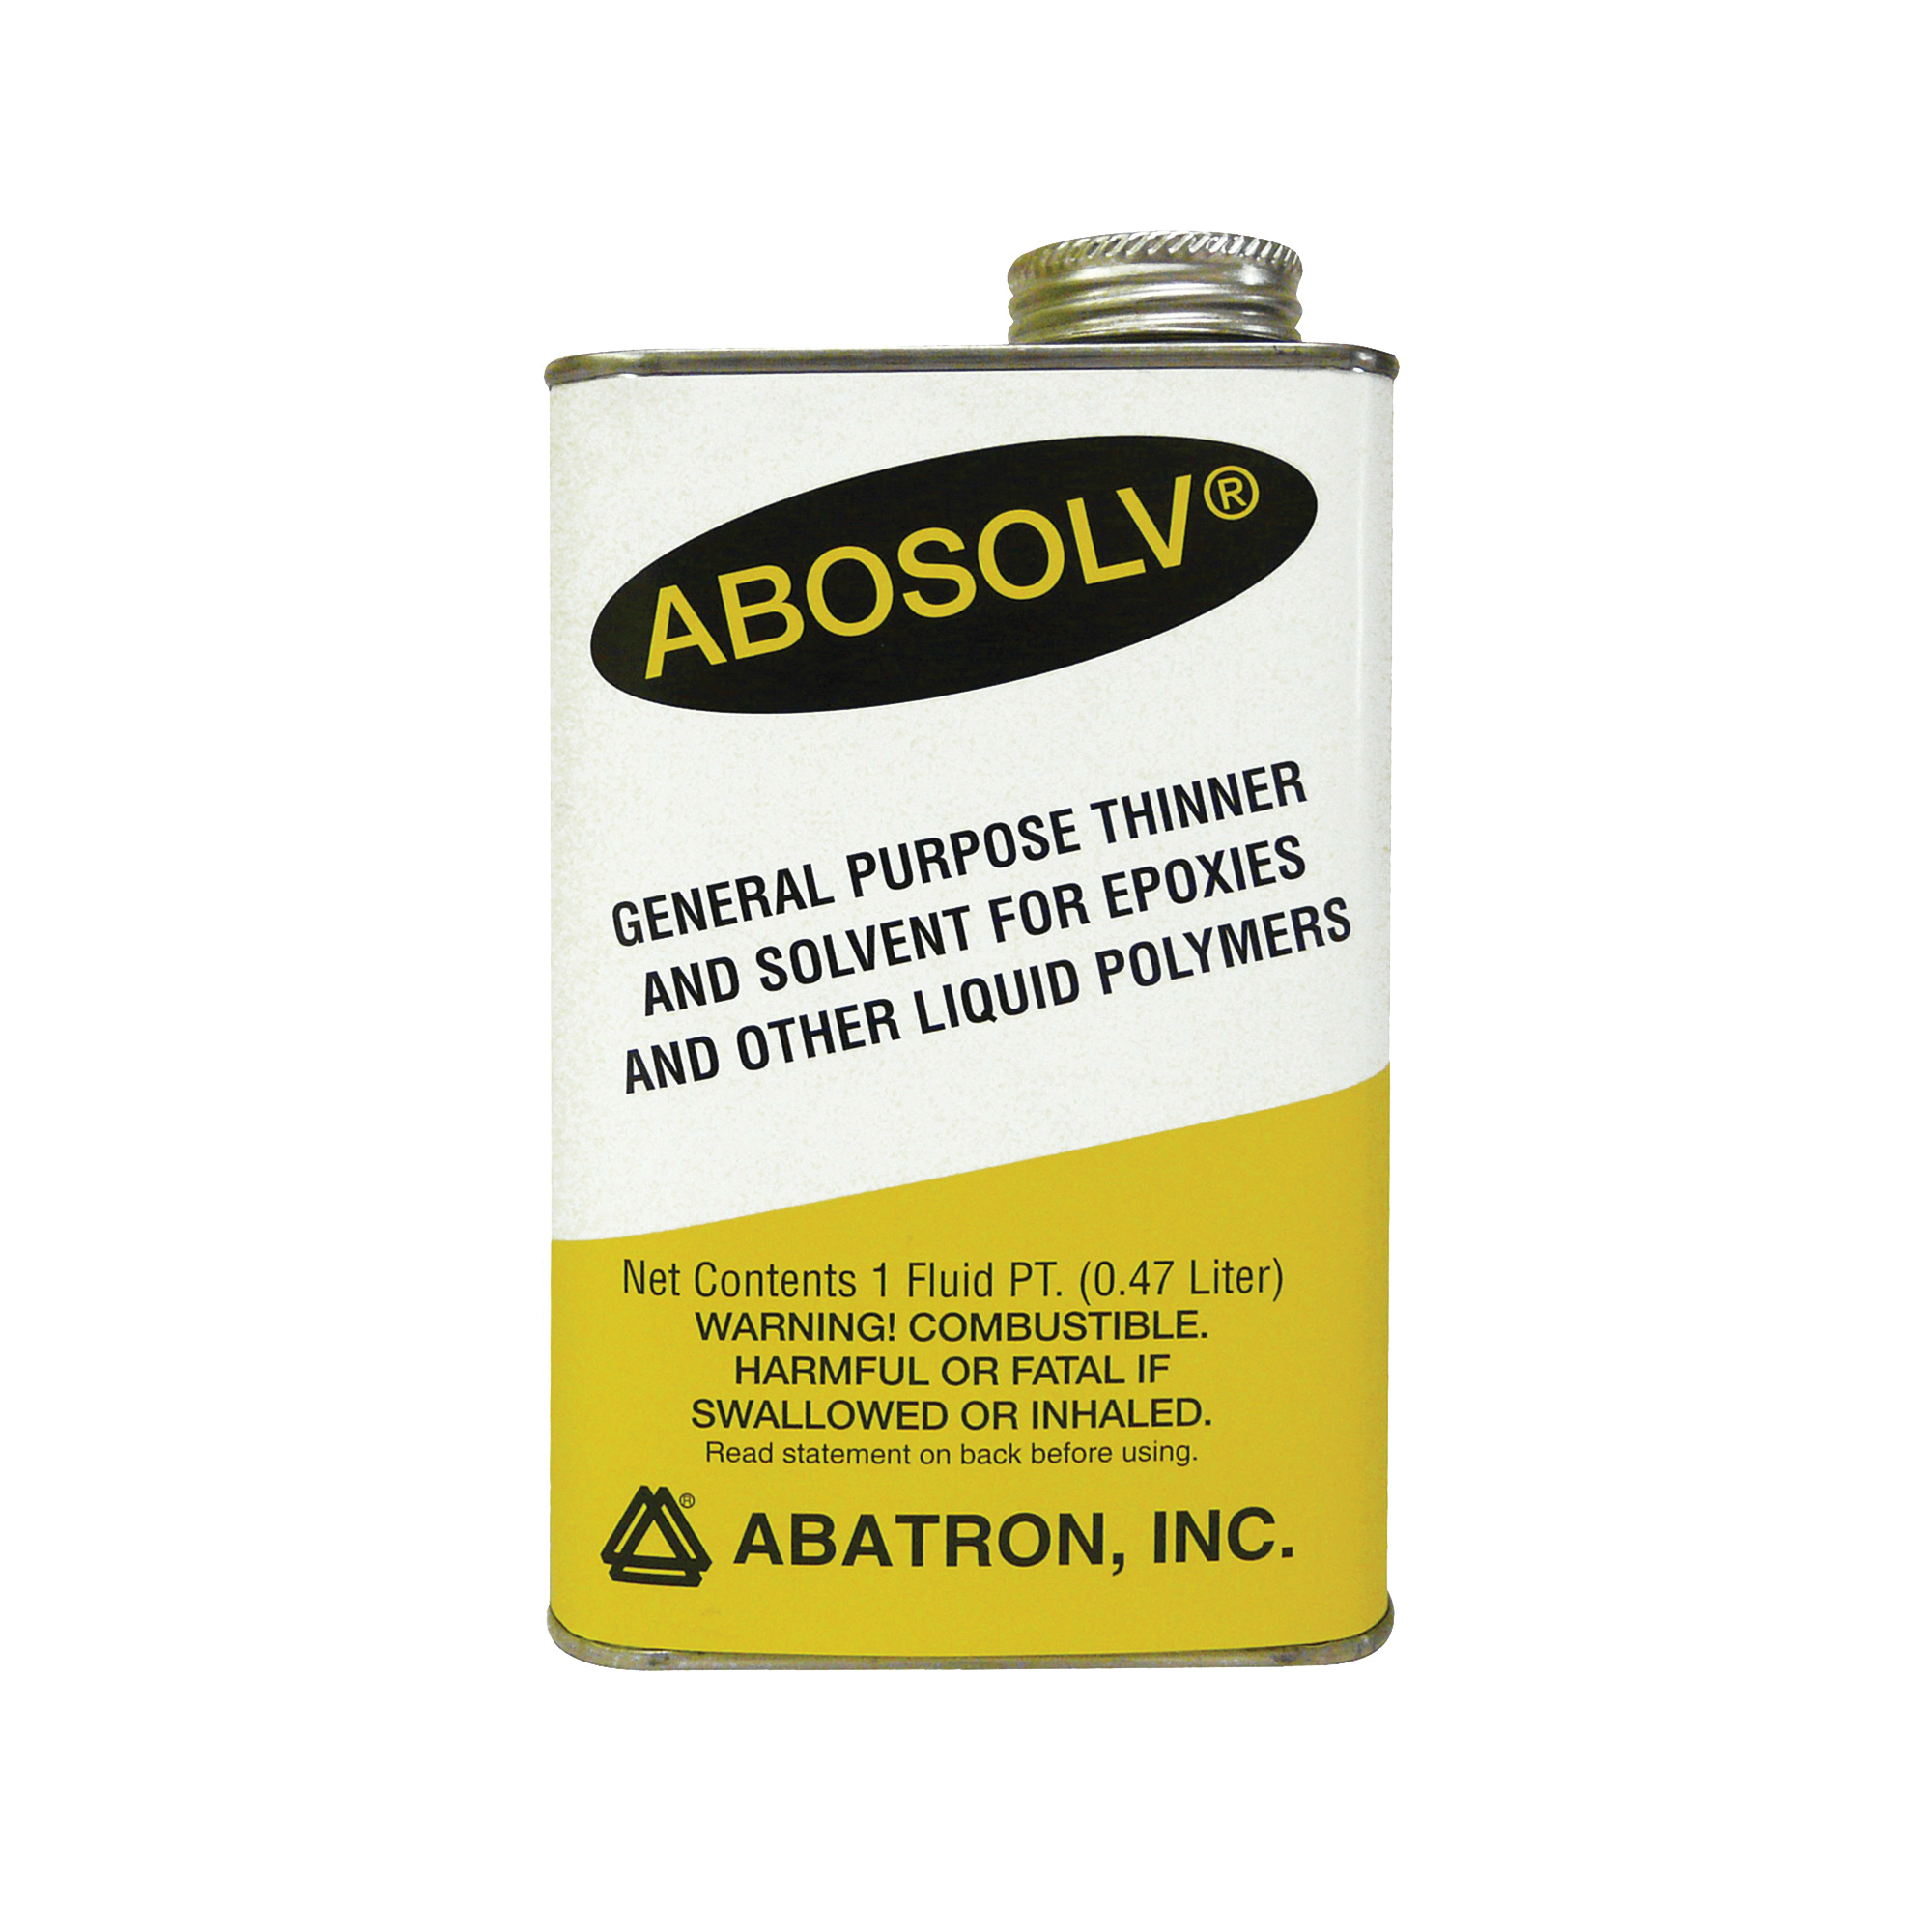 Picture of ABATRON Abosolv ASPR Wood Repair Solvent, Liquid, Irritating Aromatic, Clear, 1 pt Package